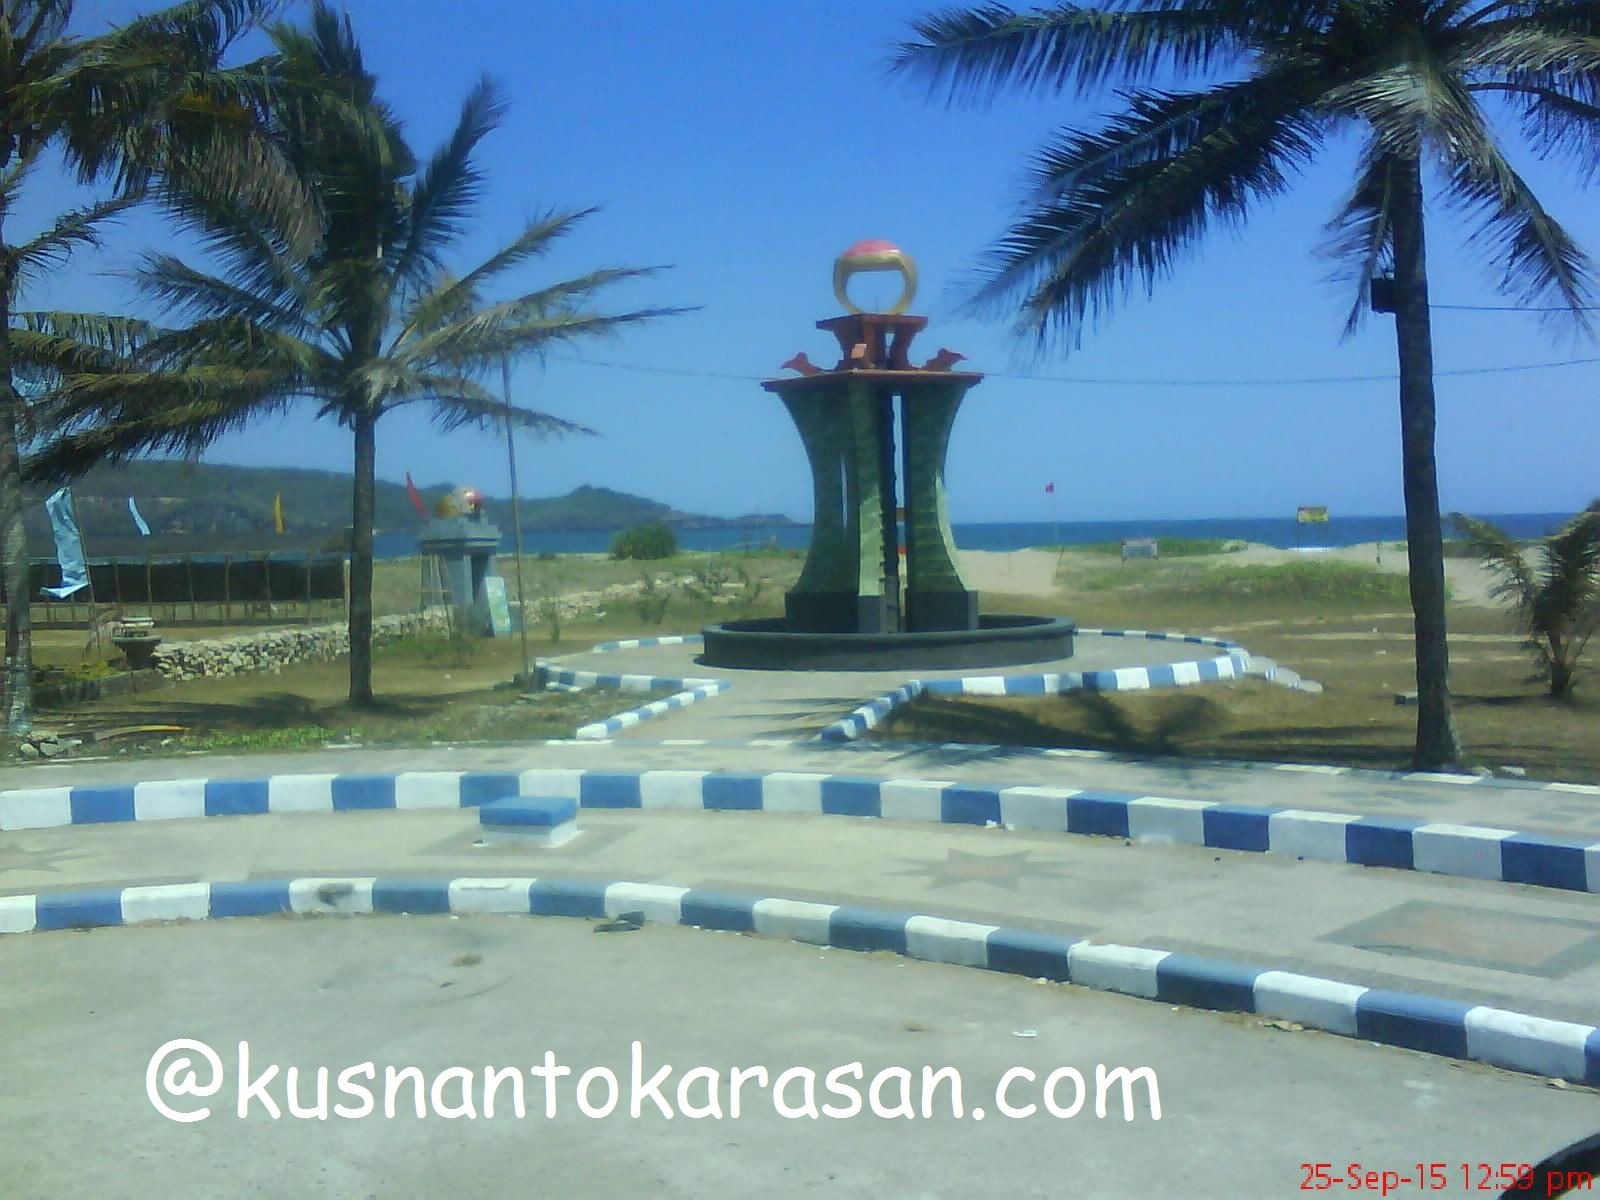 Berwisata Pantai Telengria Goa Gong Pacitan Kusnantokarasan Icon Teleng Ria